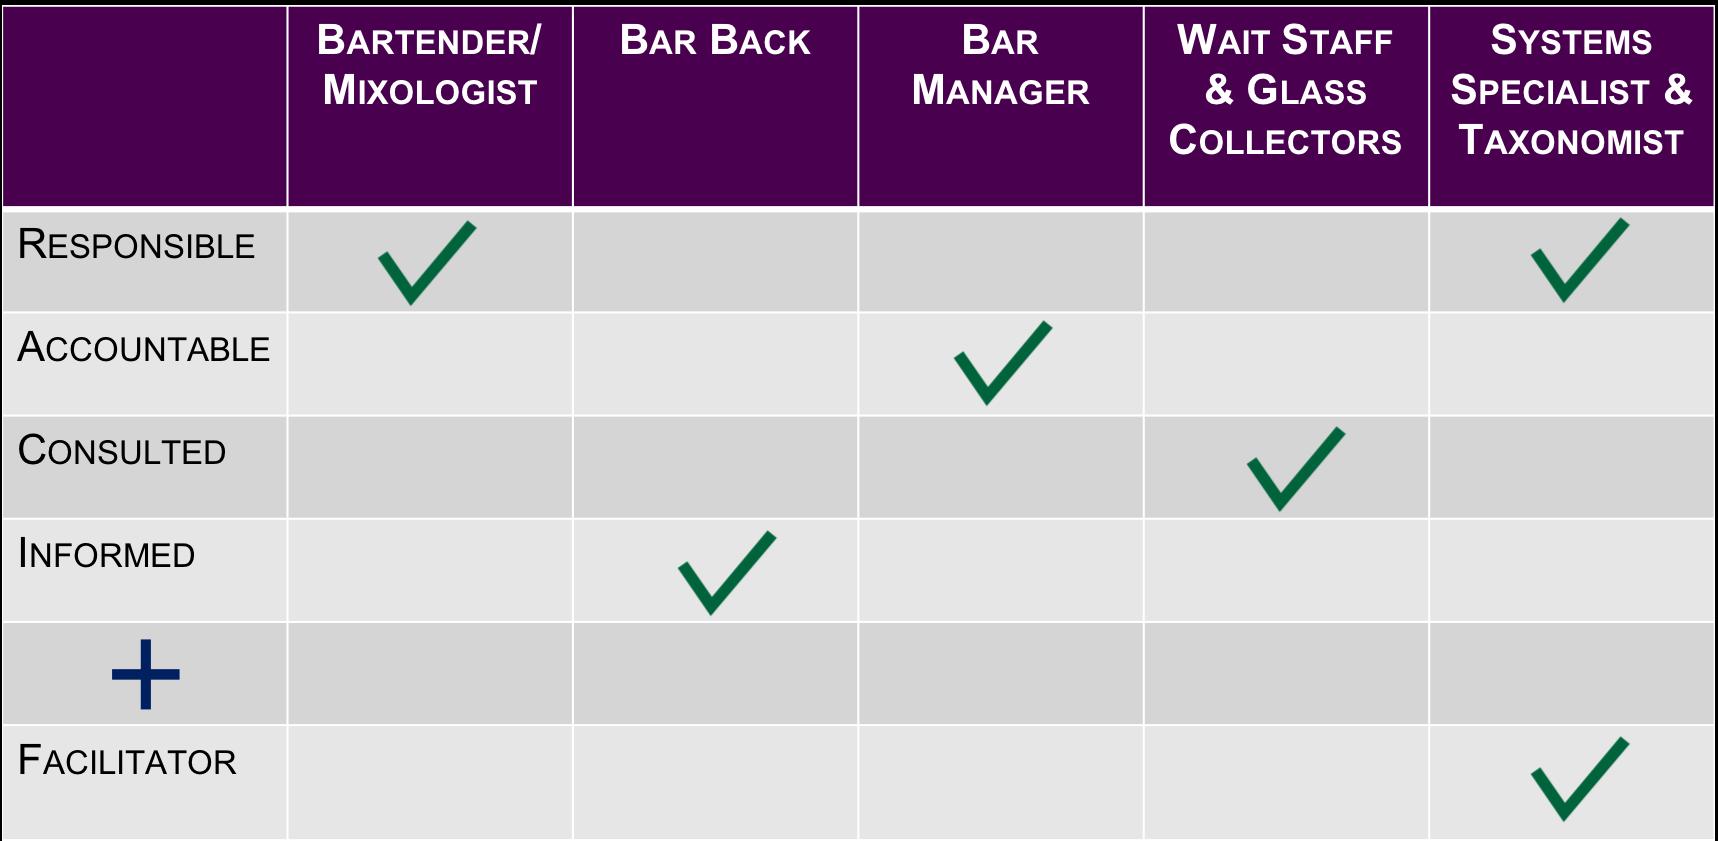 RACI+F Chart for Bartenders